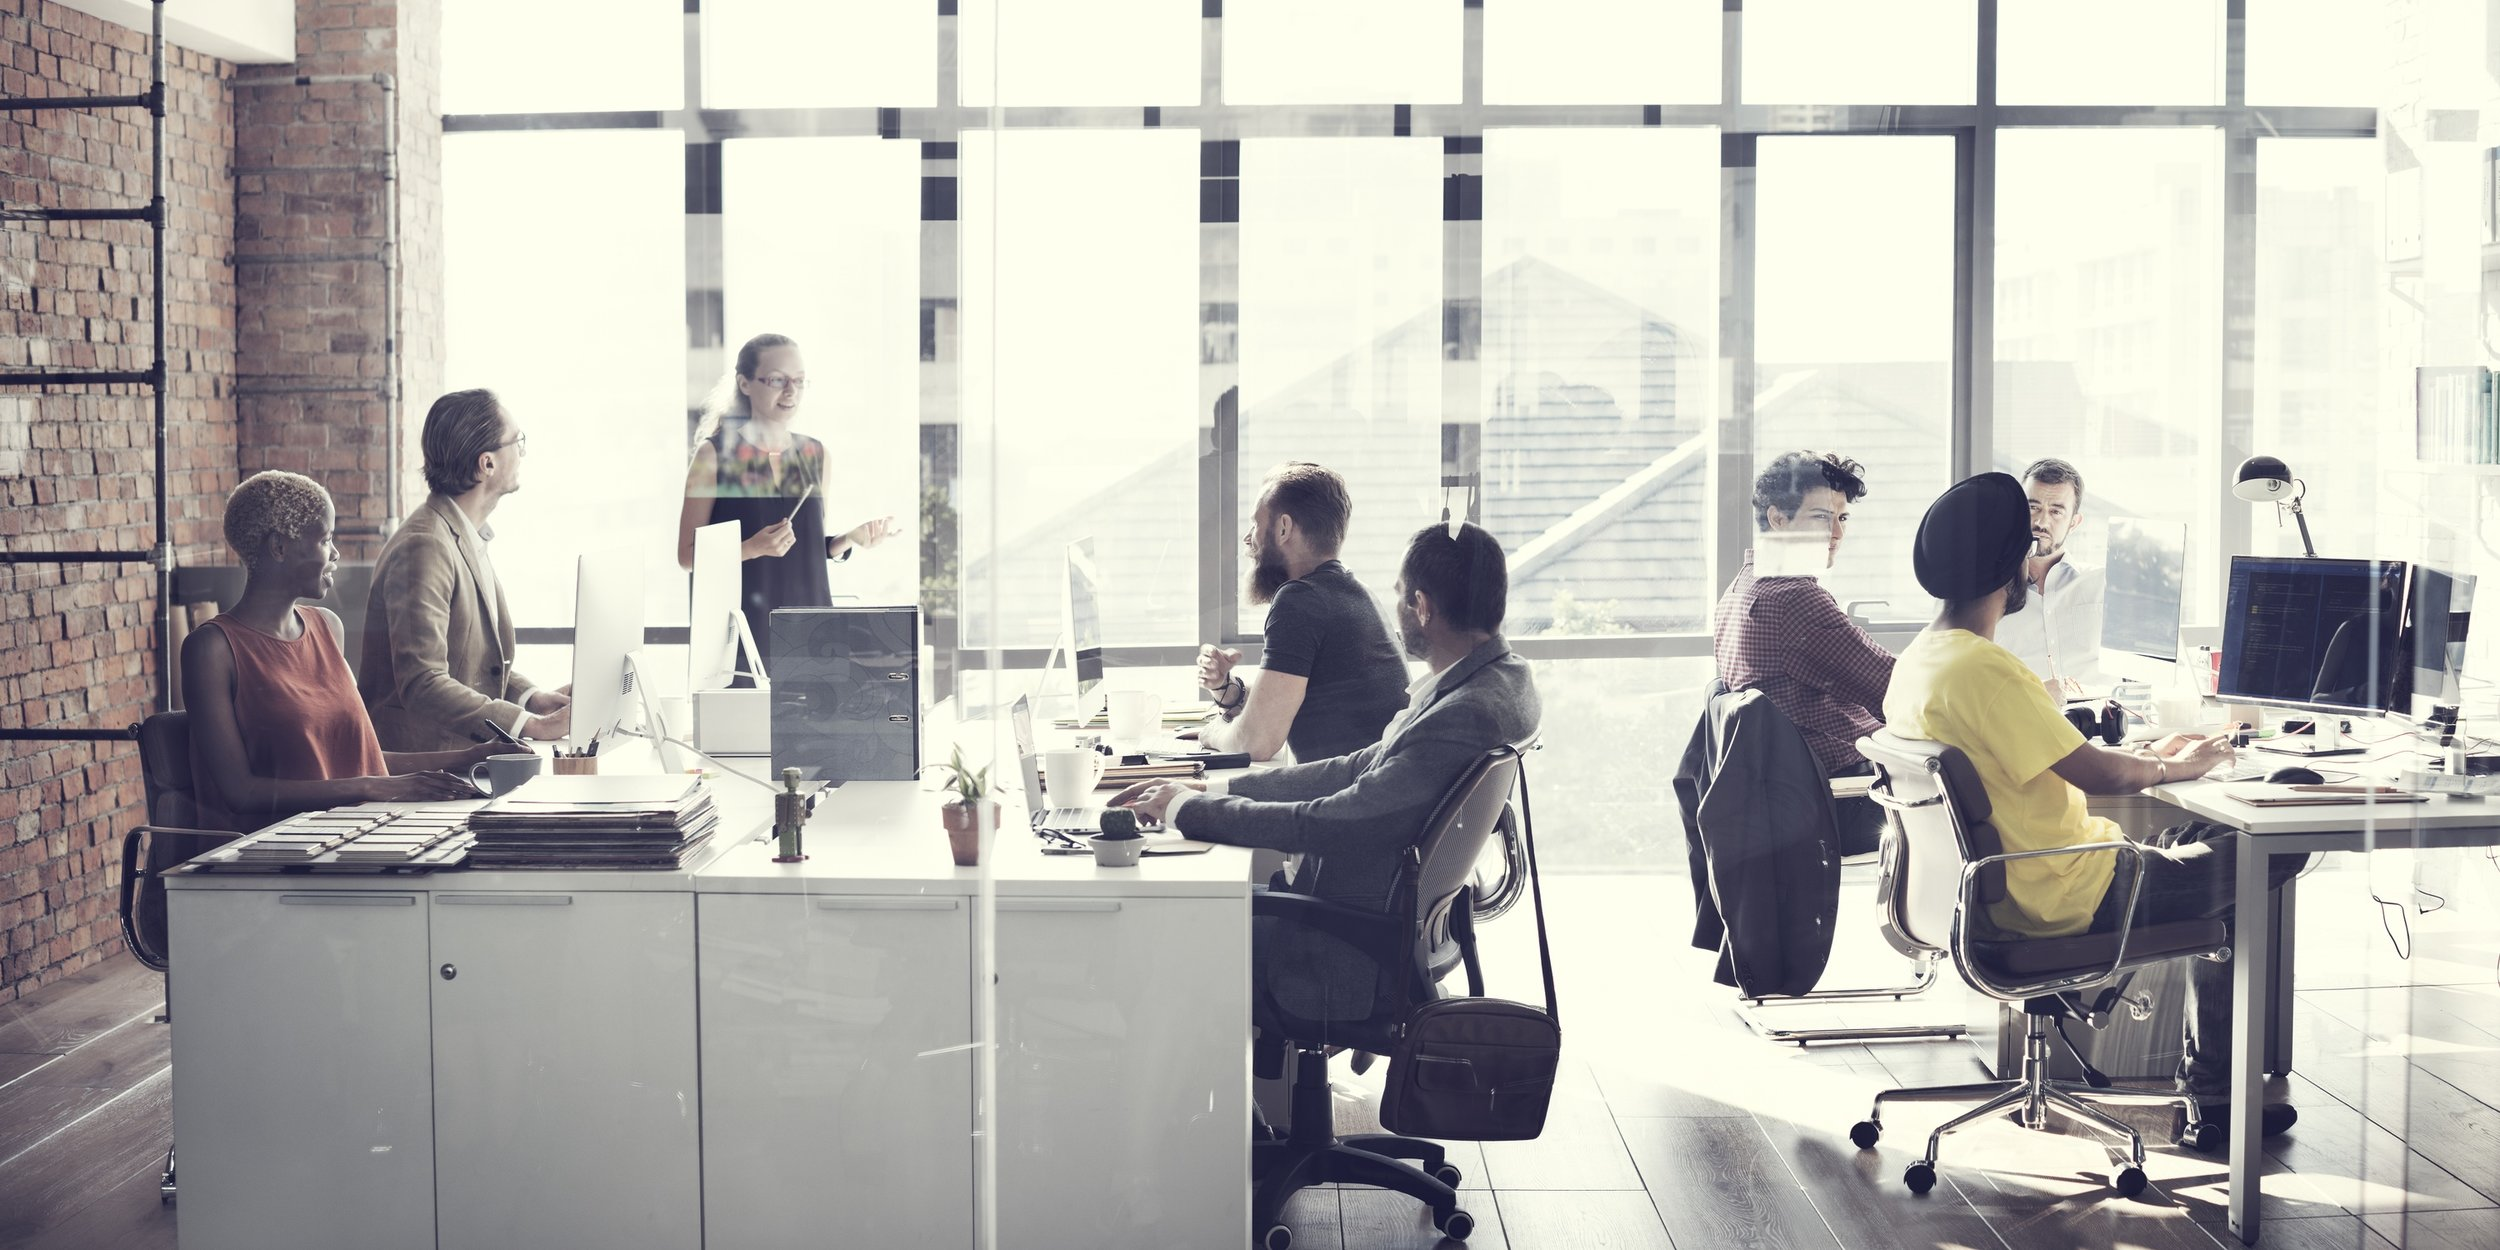 Workplace Image.jpg